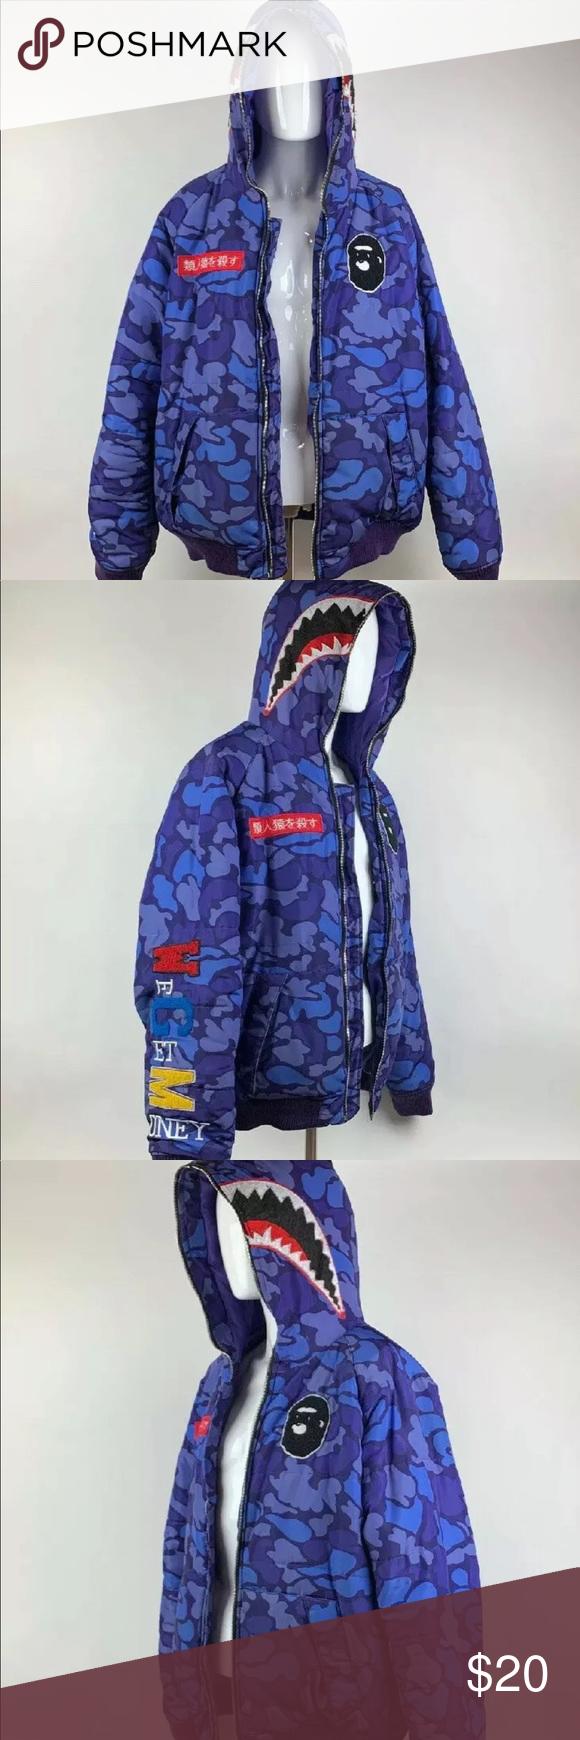 Hudson Outerwear Men S Winter Coat Purple Camo Gorilla Shark Mouth Coat Coat Is In Great Condition But The Front Zippe Winter Coat Mens Winter Coat Outerwear [ 1740 x 580 Pixel ]